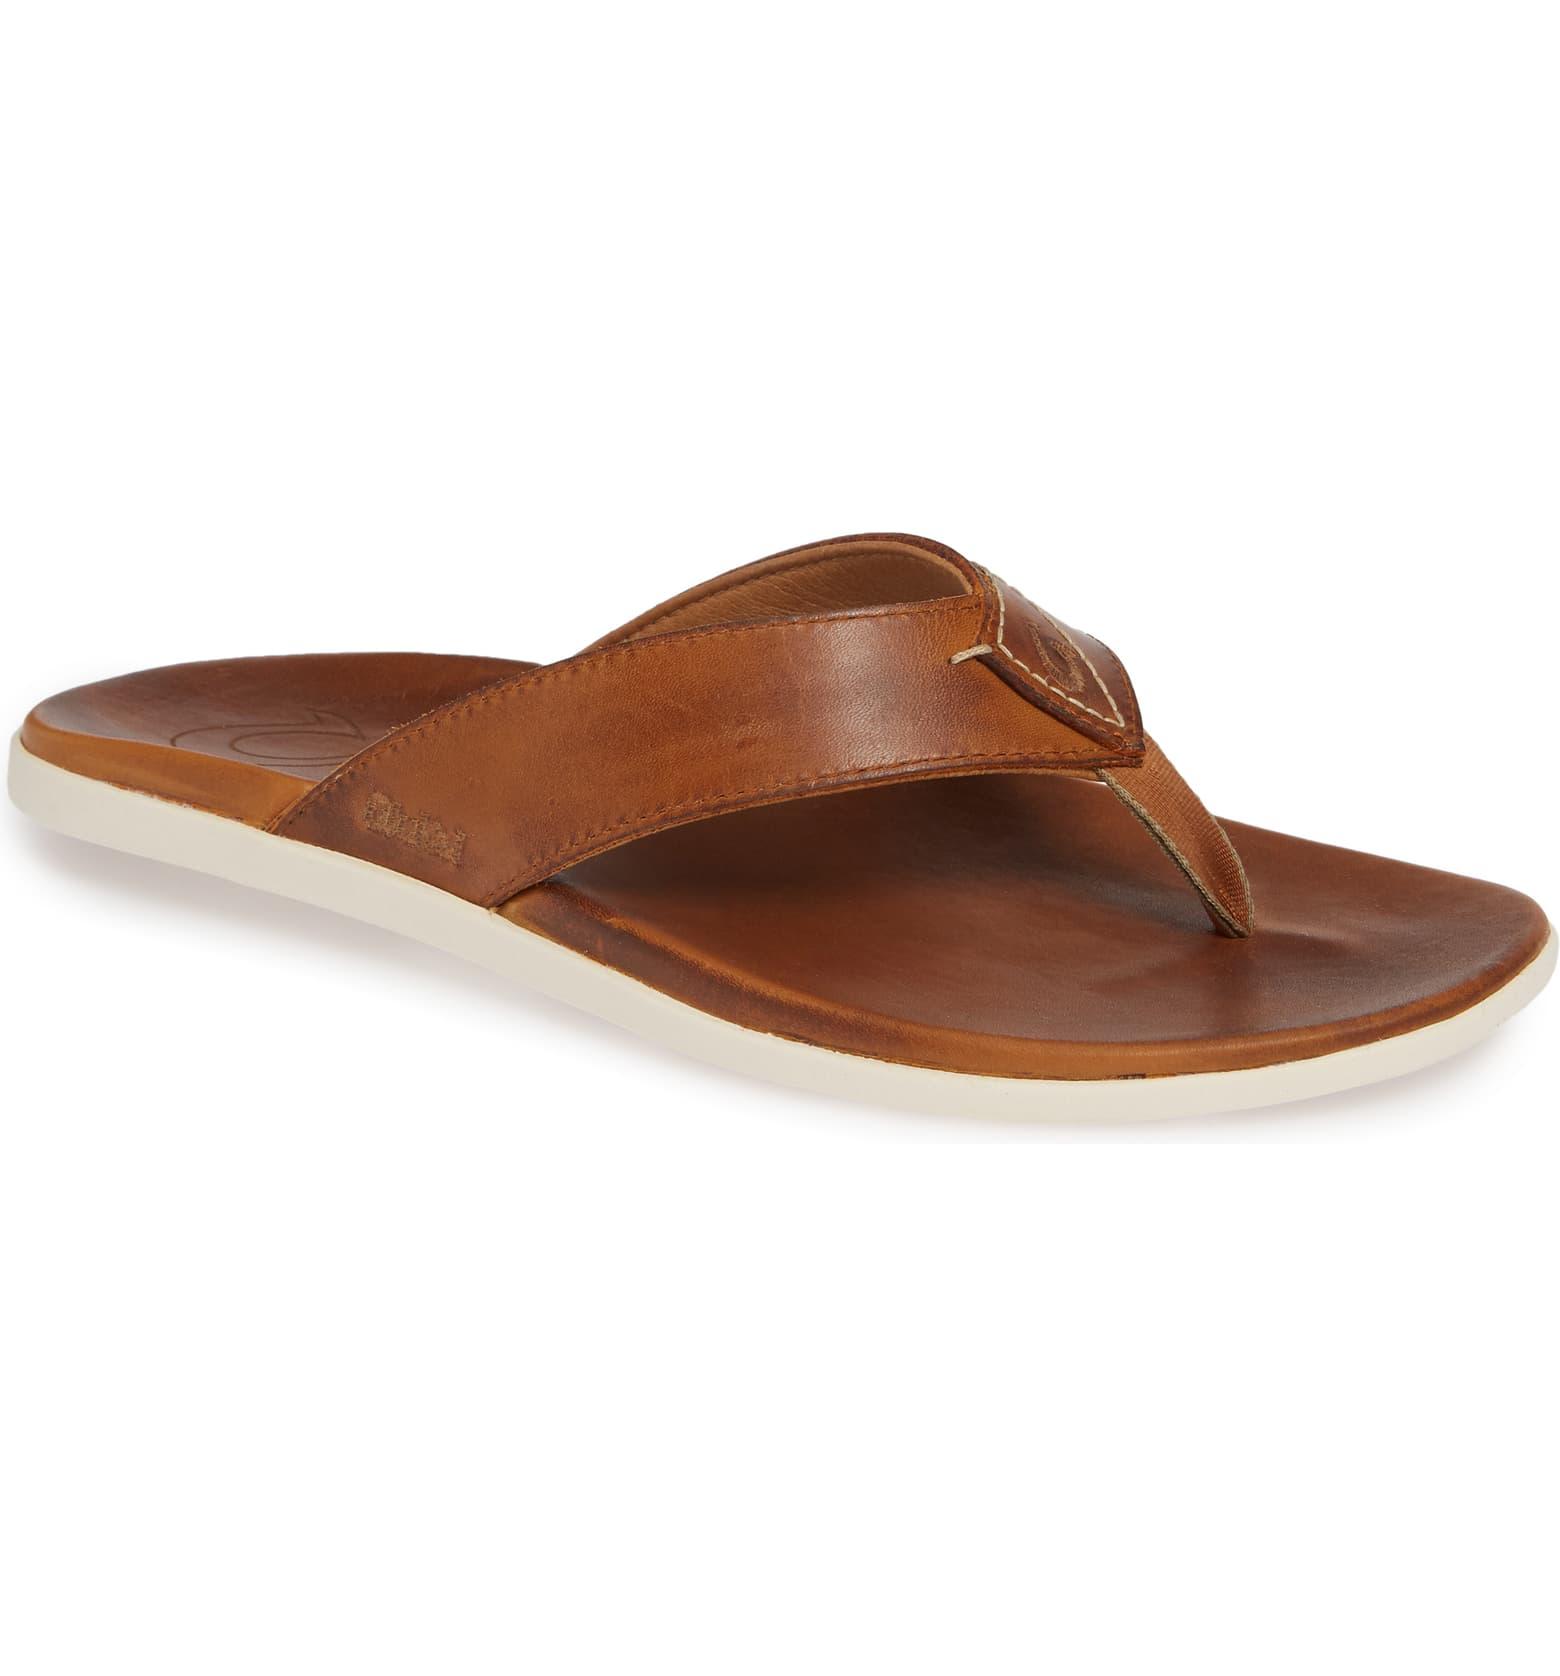 Leather Flip-Flop